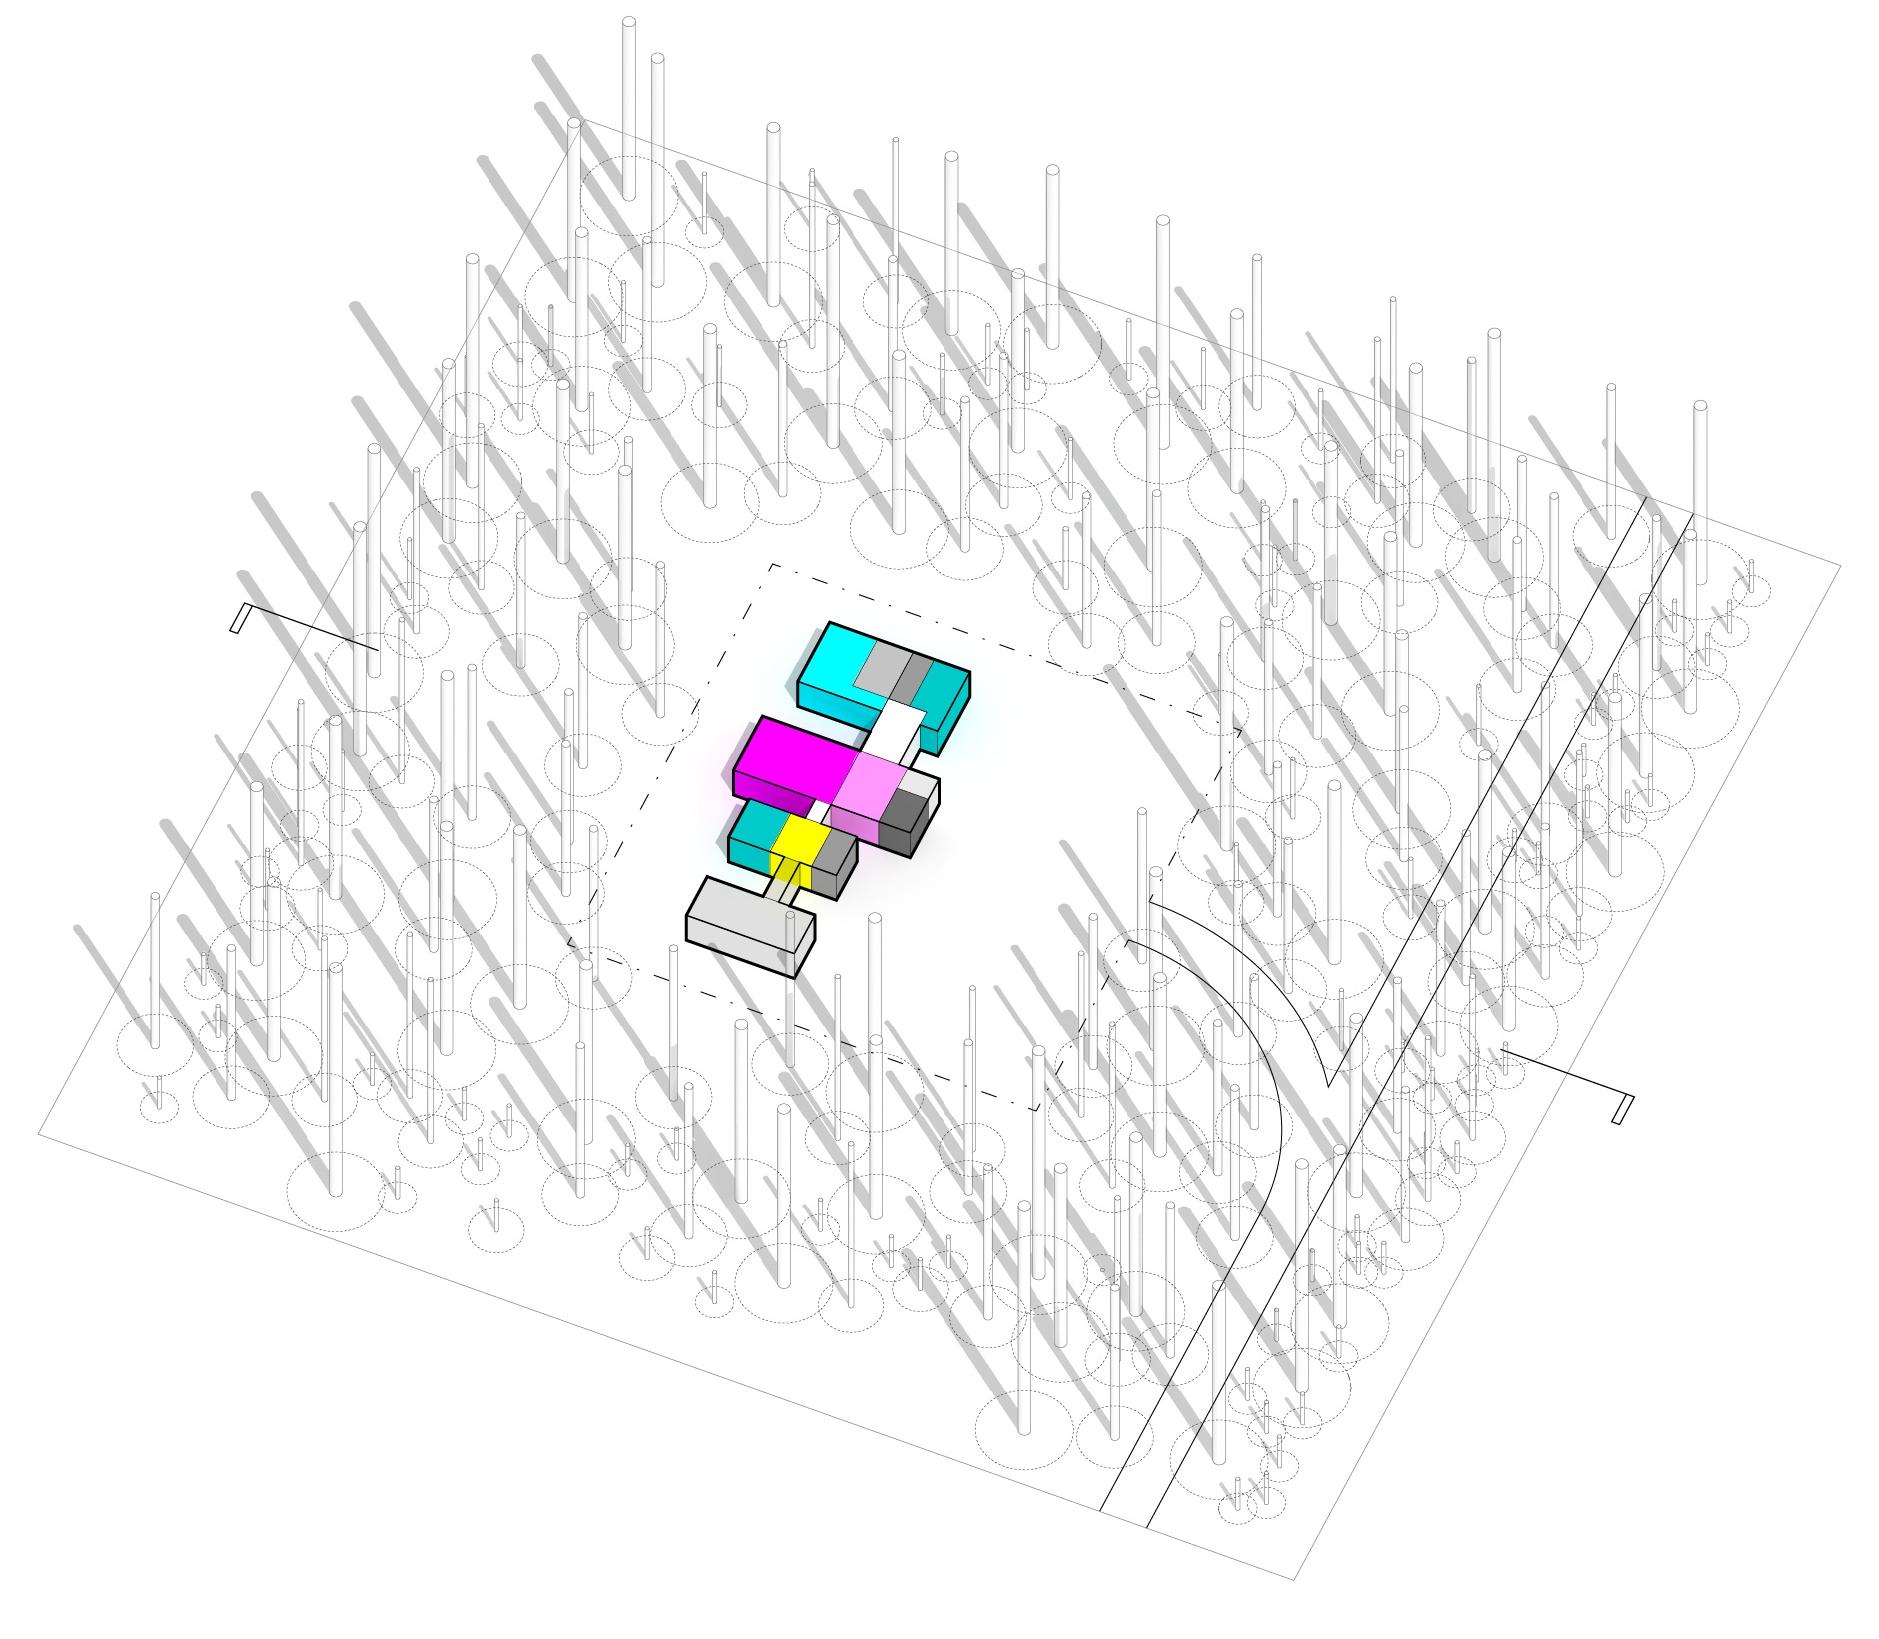 180707_MASSING AXON-04.jpg